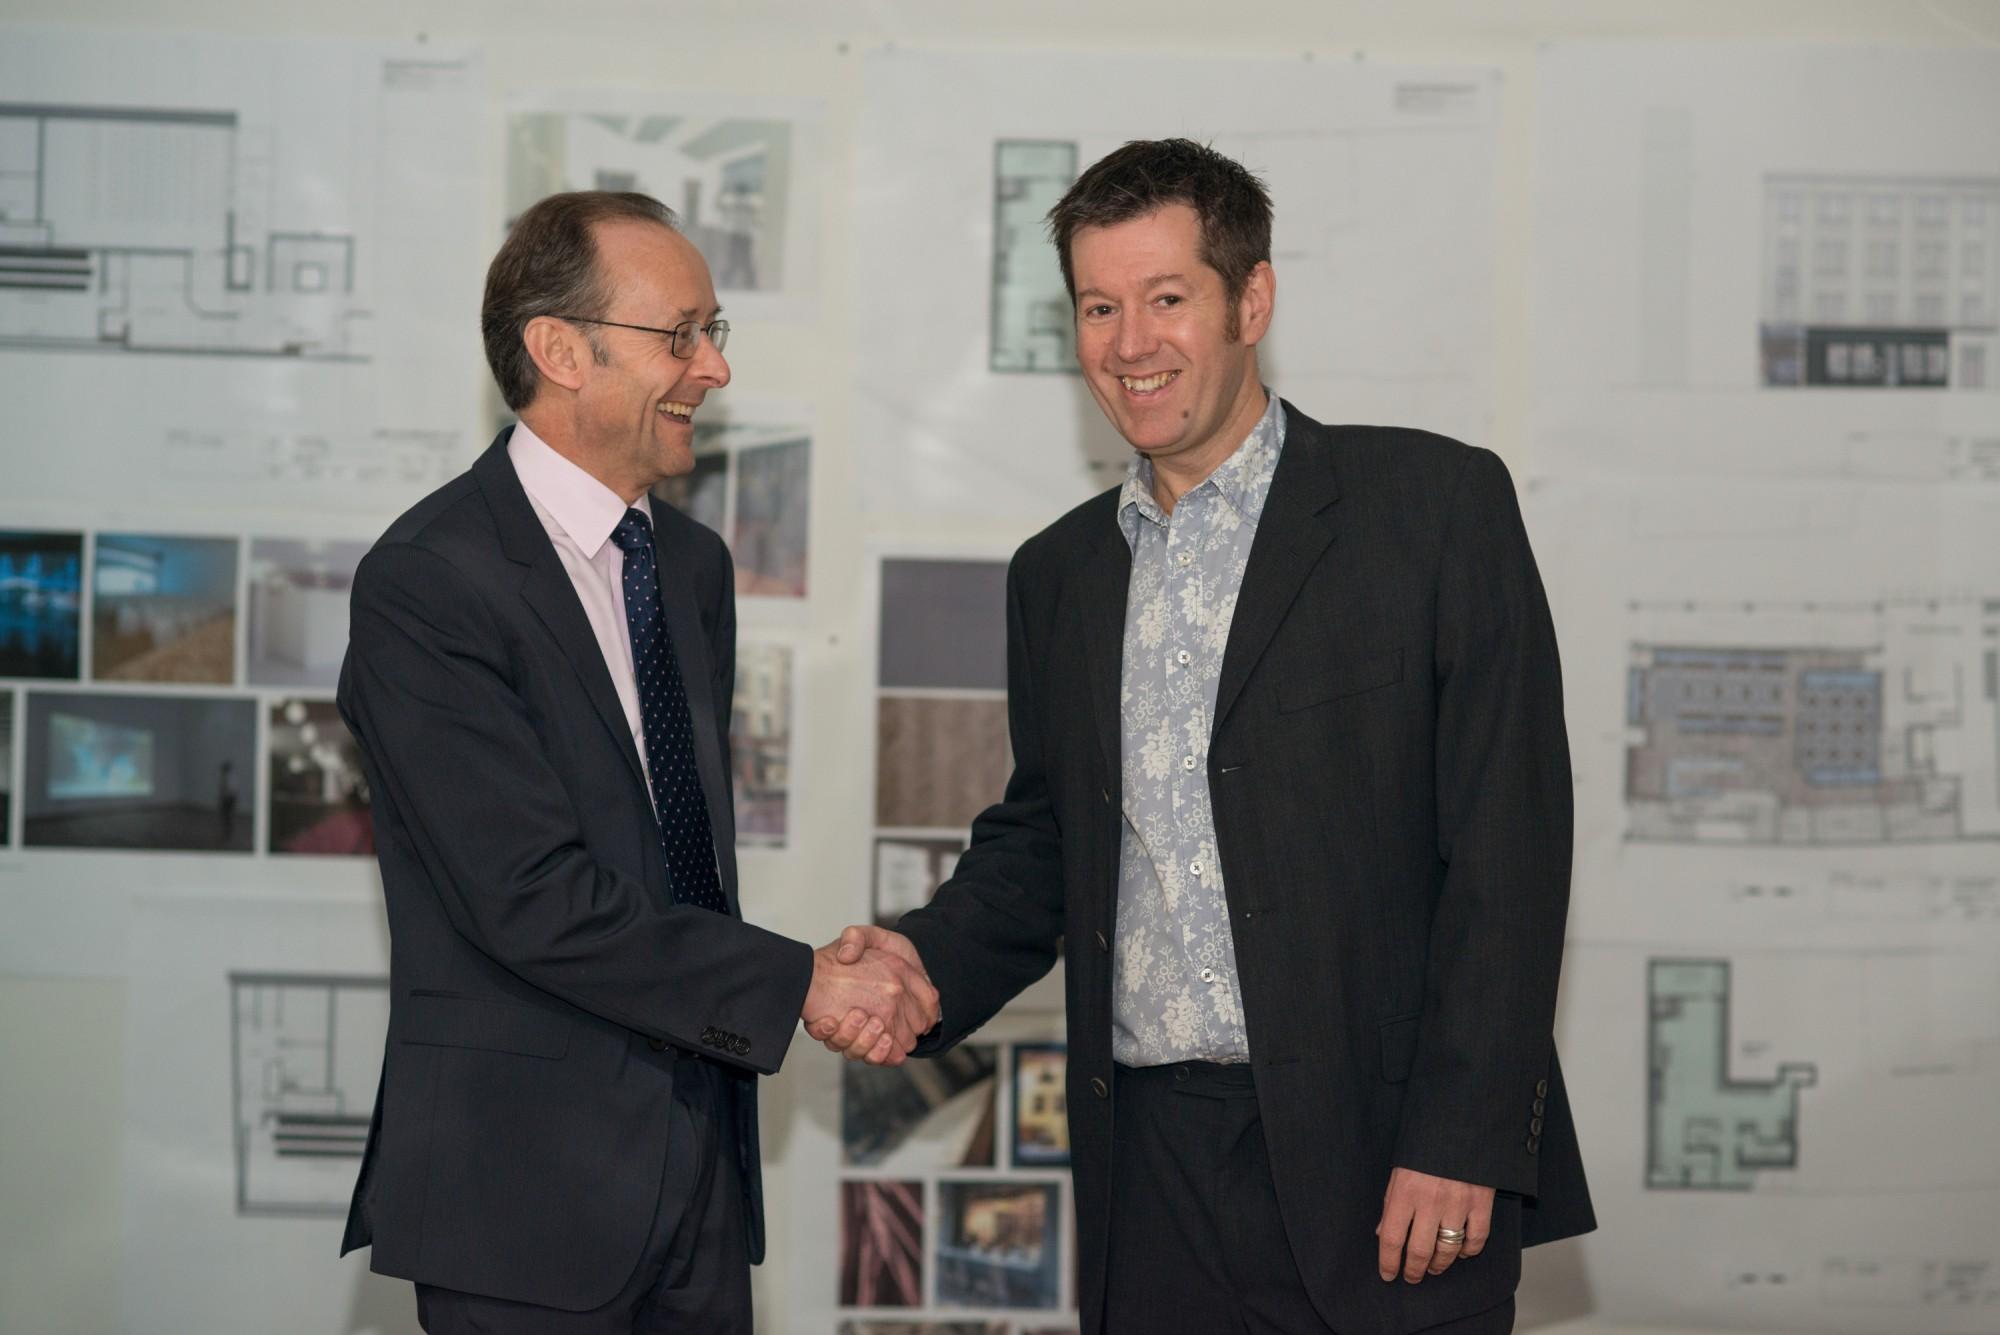 Tyneside Cinema Mark Dobson and Hugh Welch Oct 2013